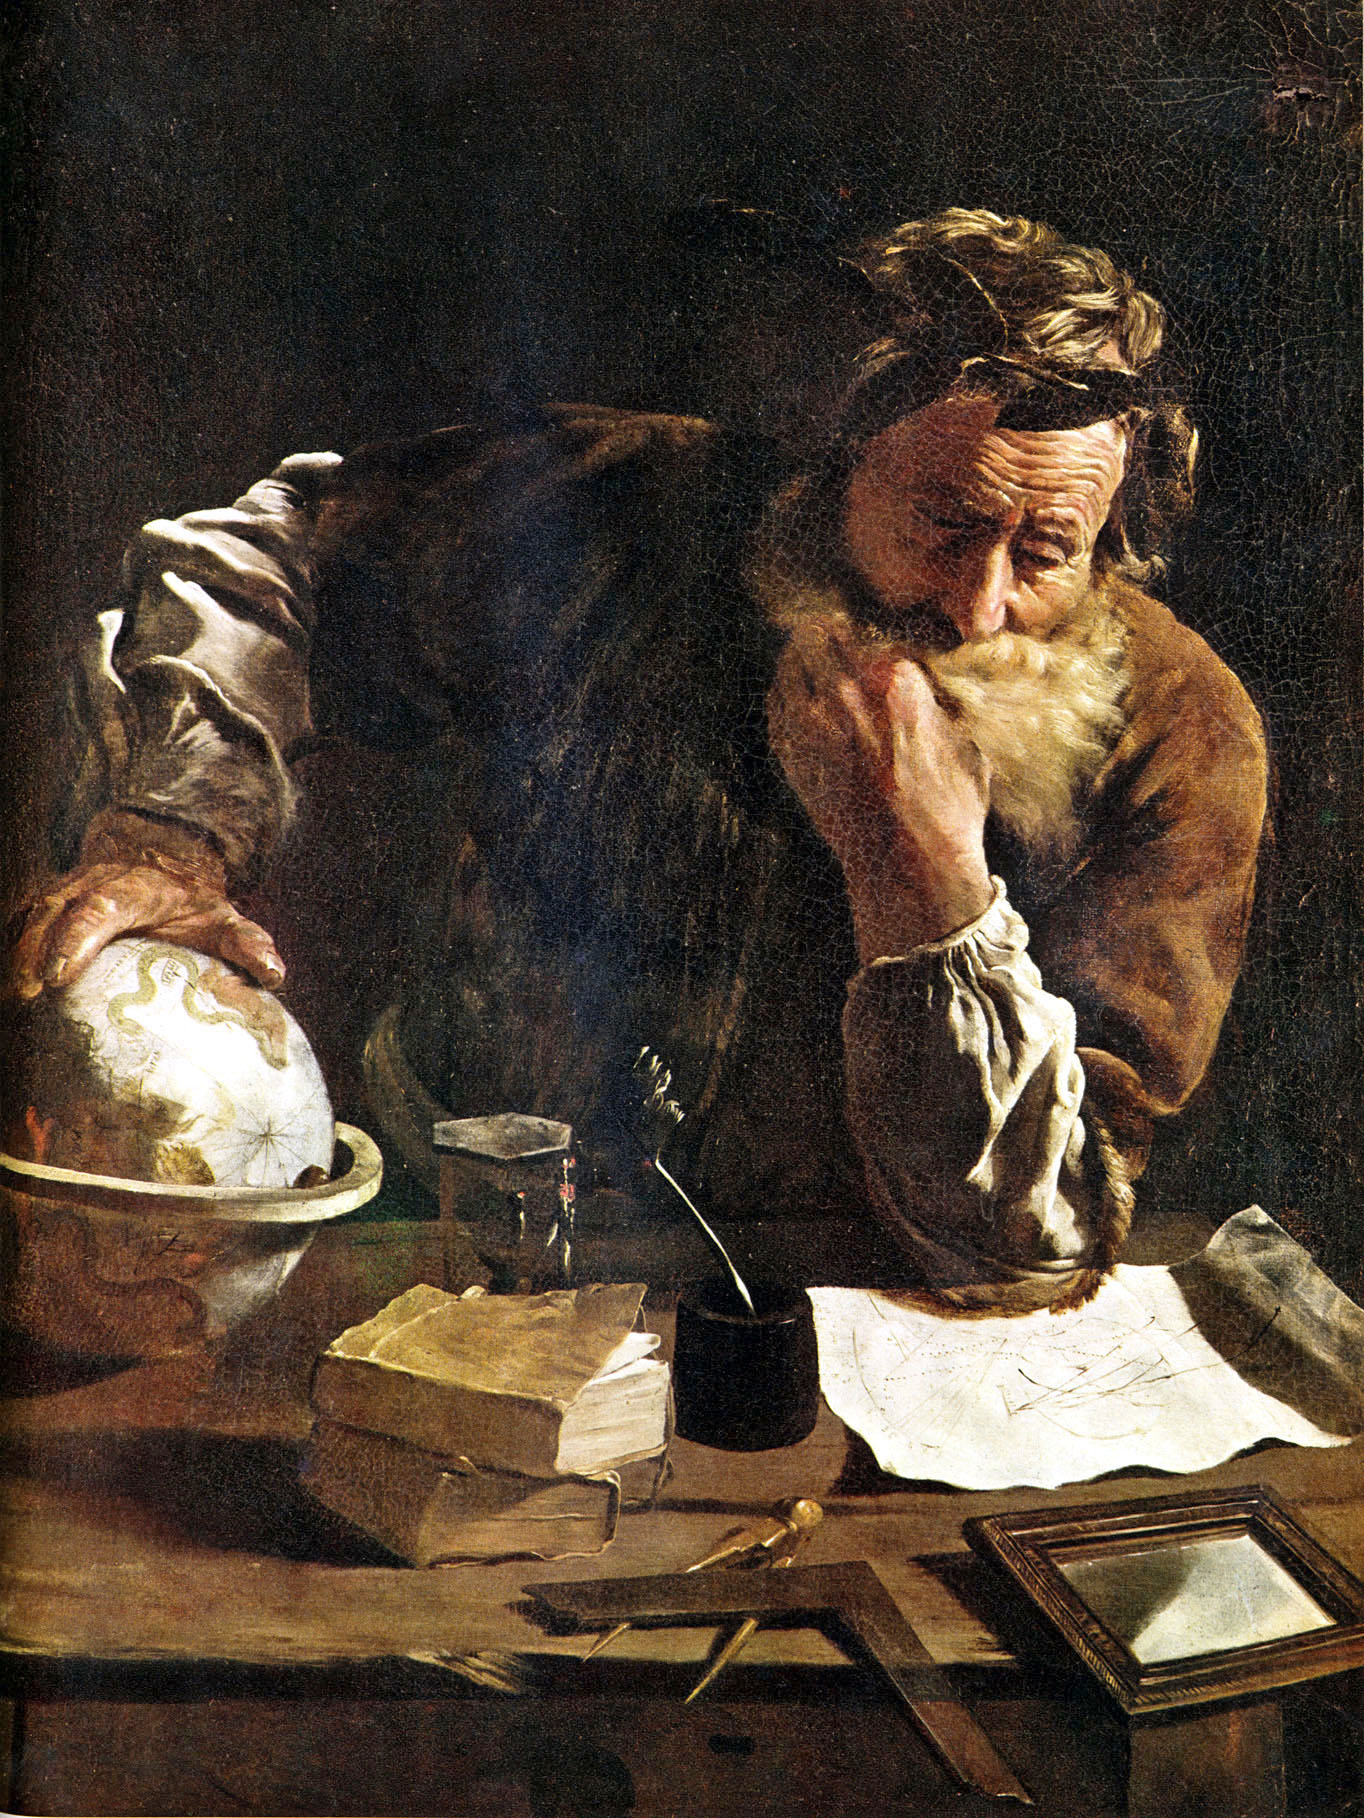 Särskilt om brodern heter Arkimedes...